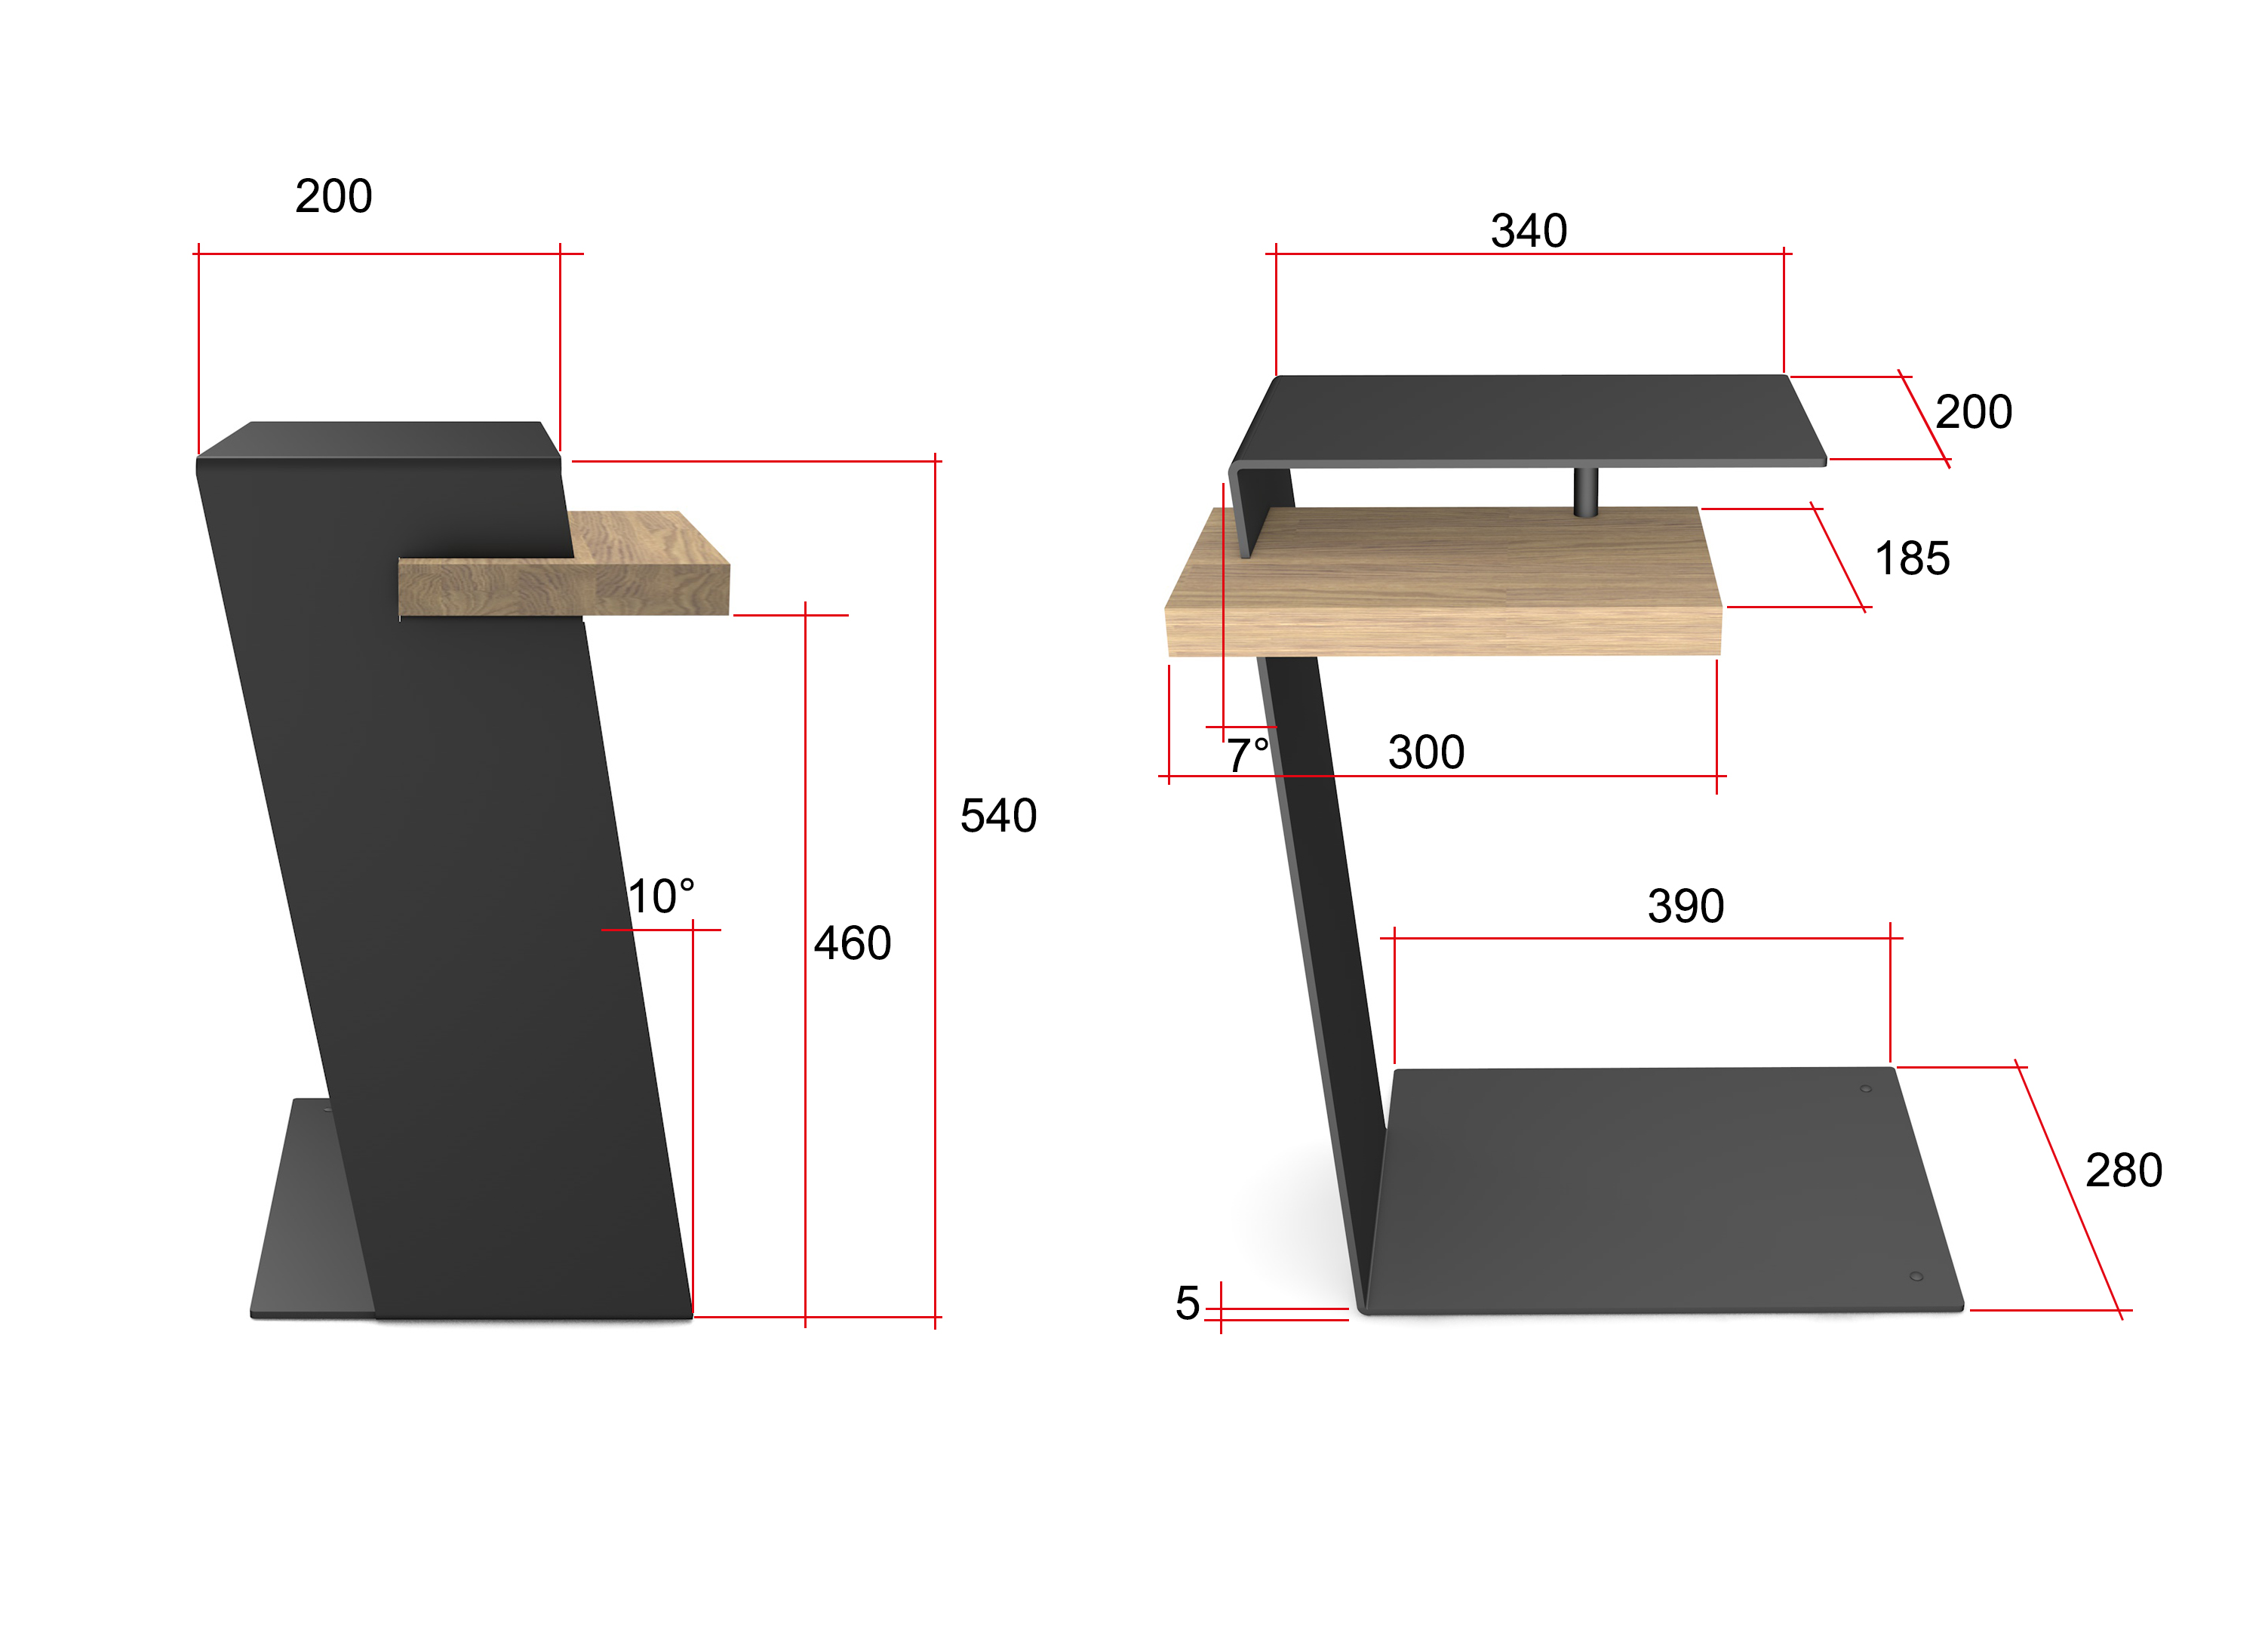 Home3000 Beistelltisch Metalltisch Design Beistelltisch